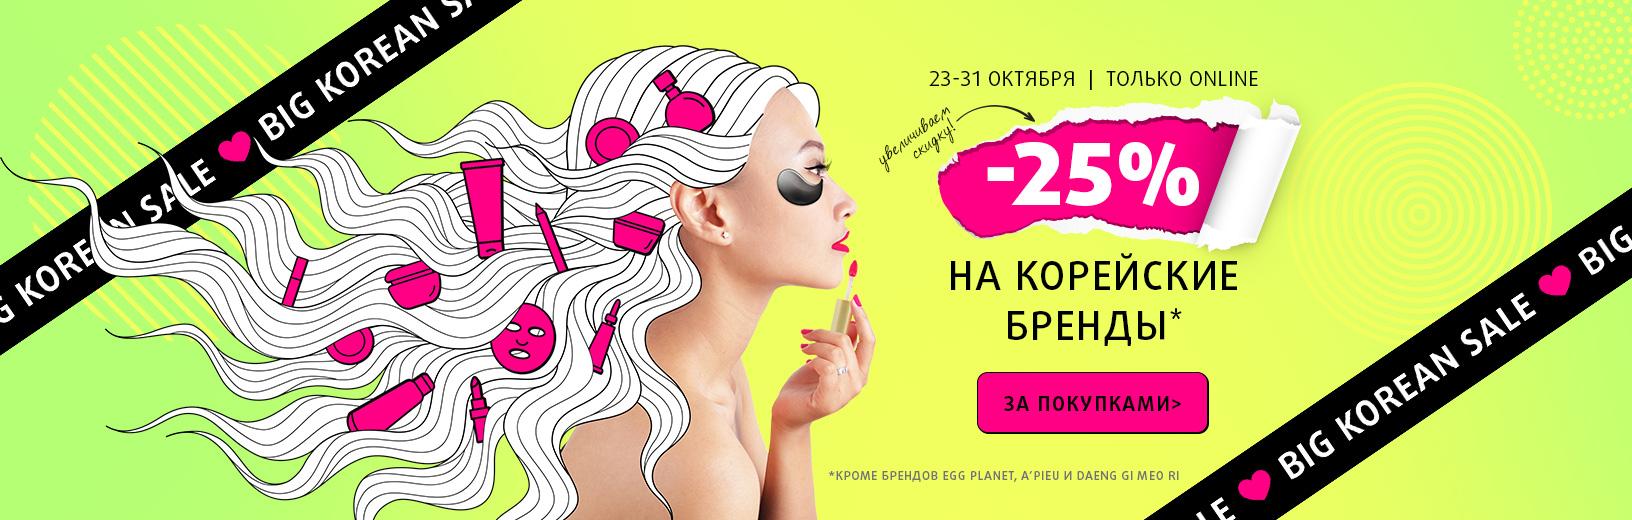 Big Korean Sale: -25% на корейские бренды